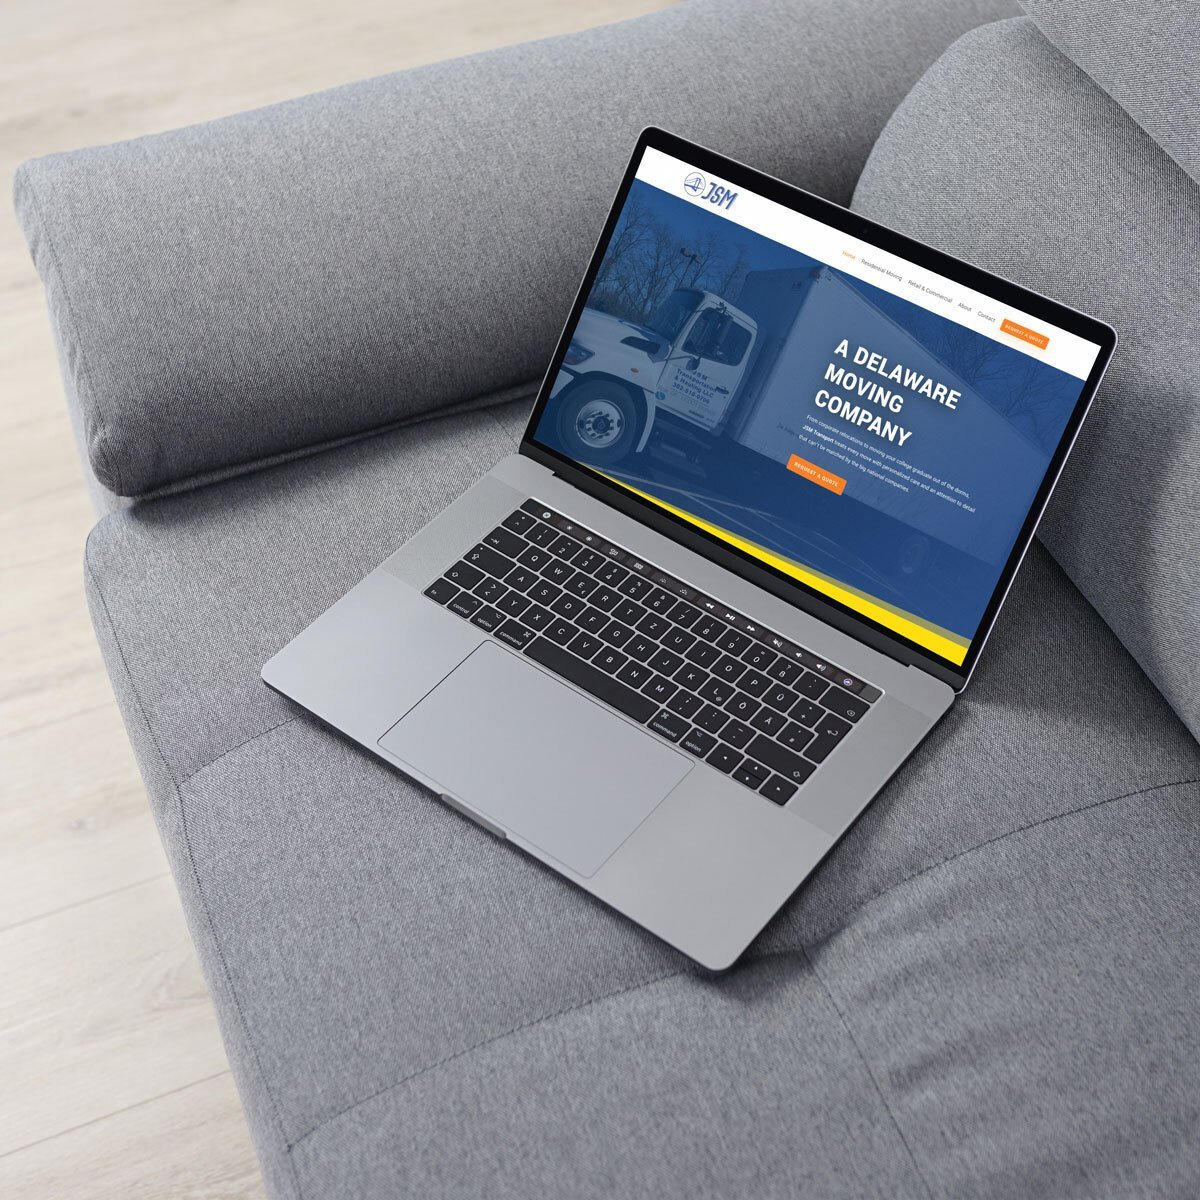 Moving company website design from BrandSwan, a Delaware web design agency